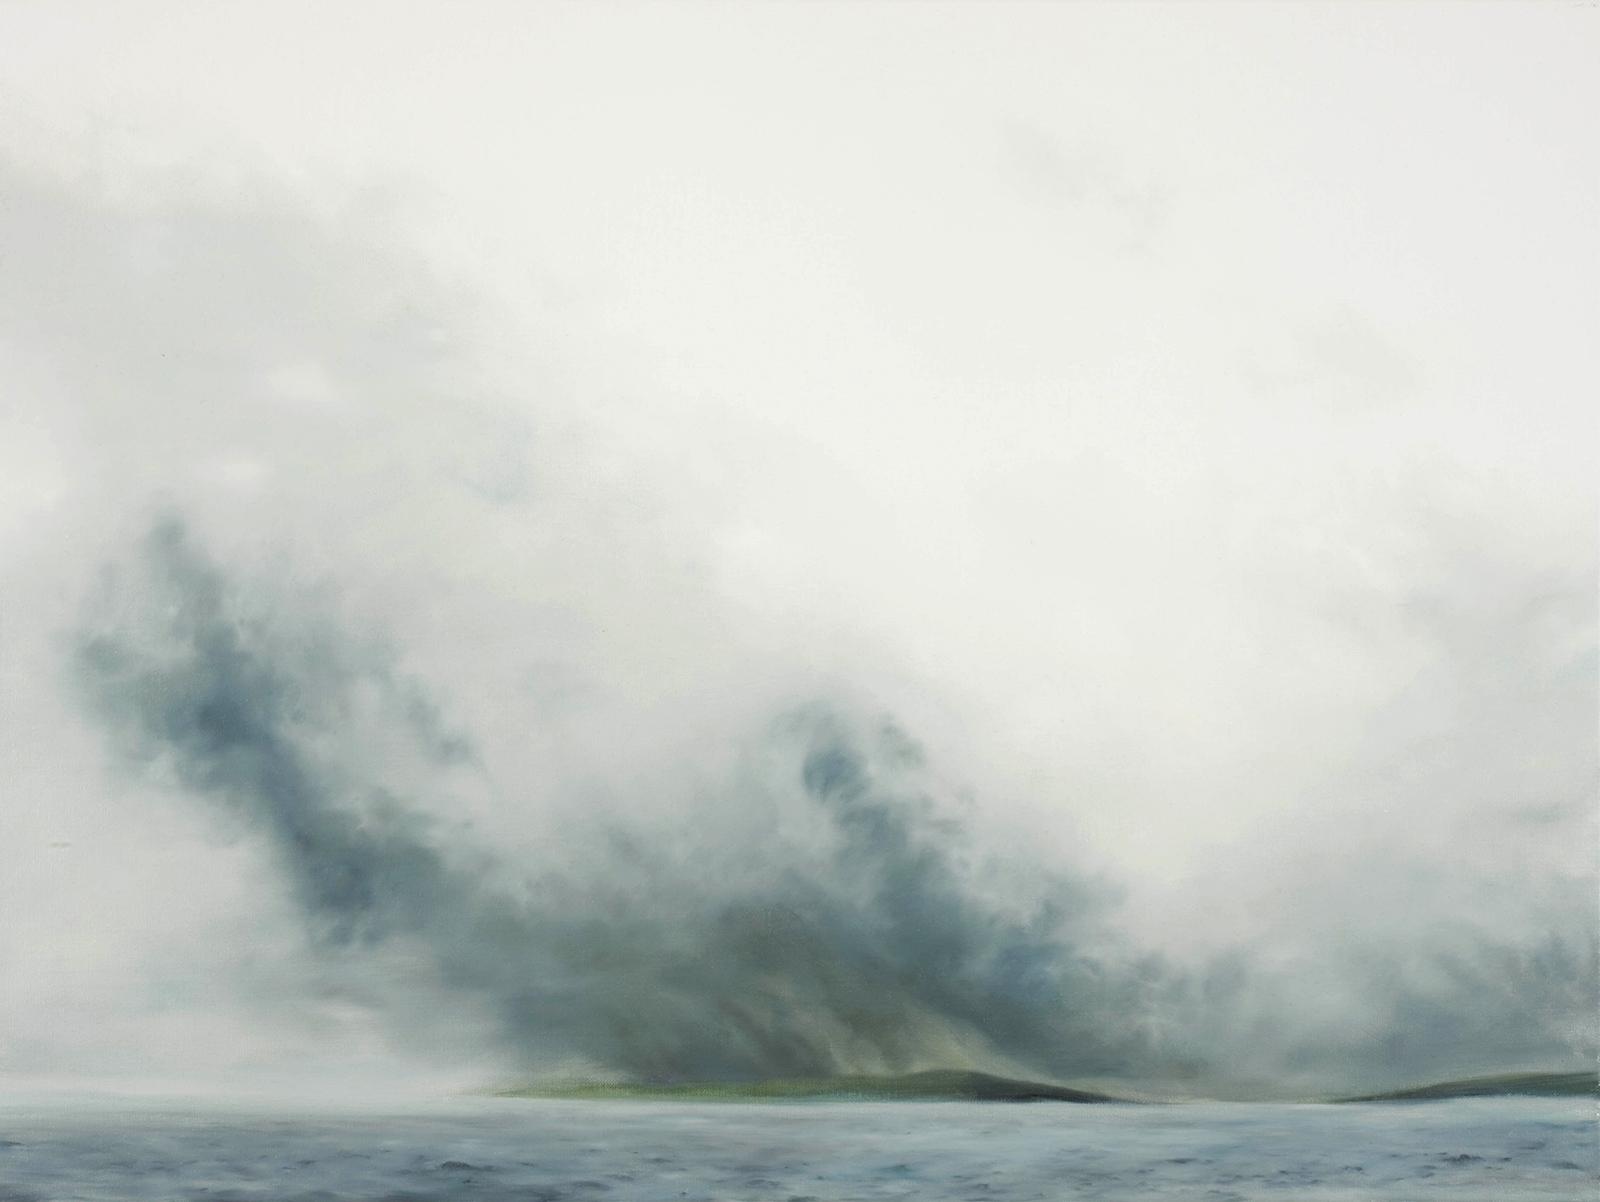 Nordland 2007, 62 x 83 cm, Öl auf Leinwand  Nordland 2007, oil on canvas